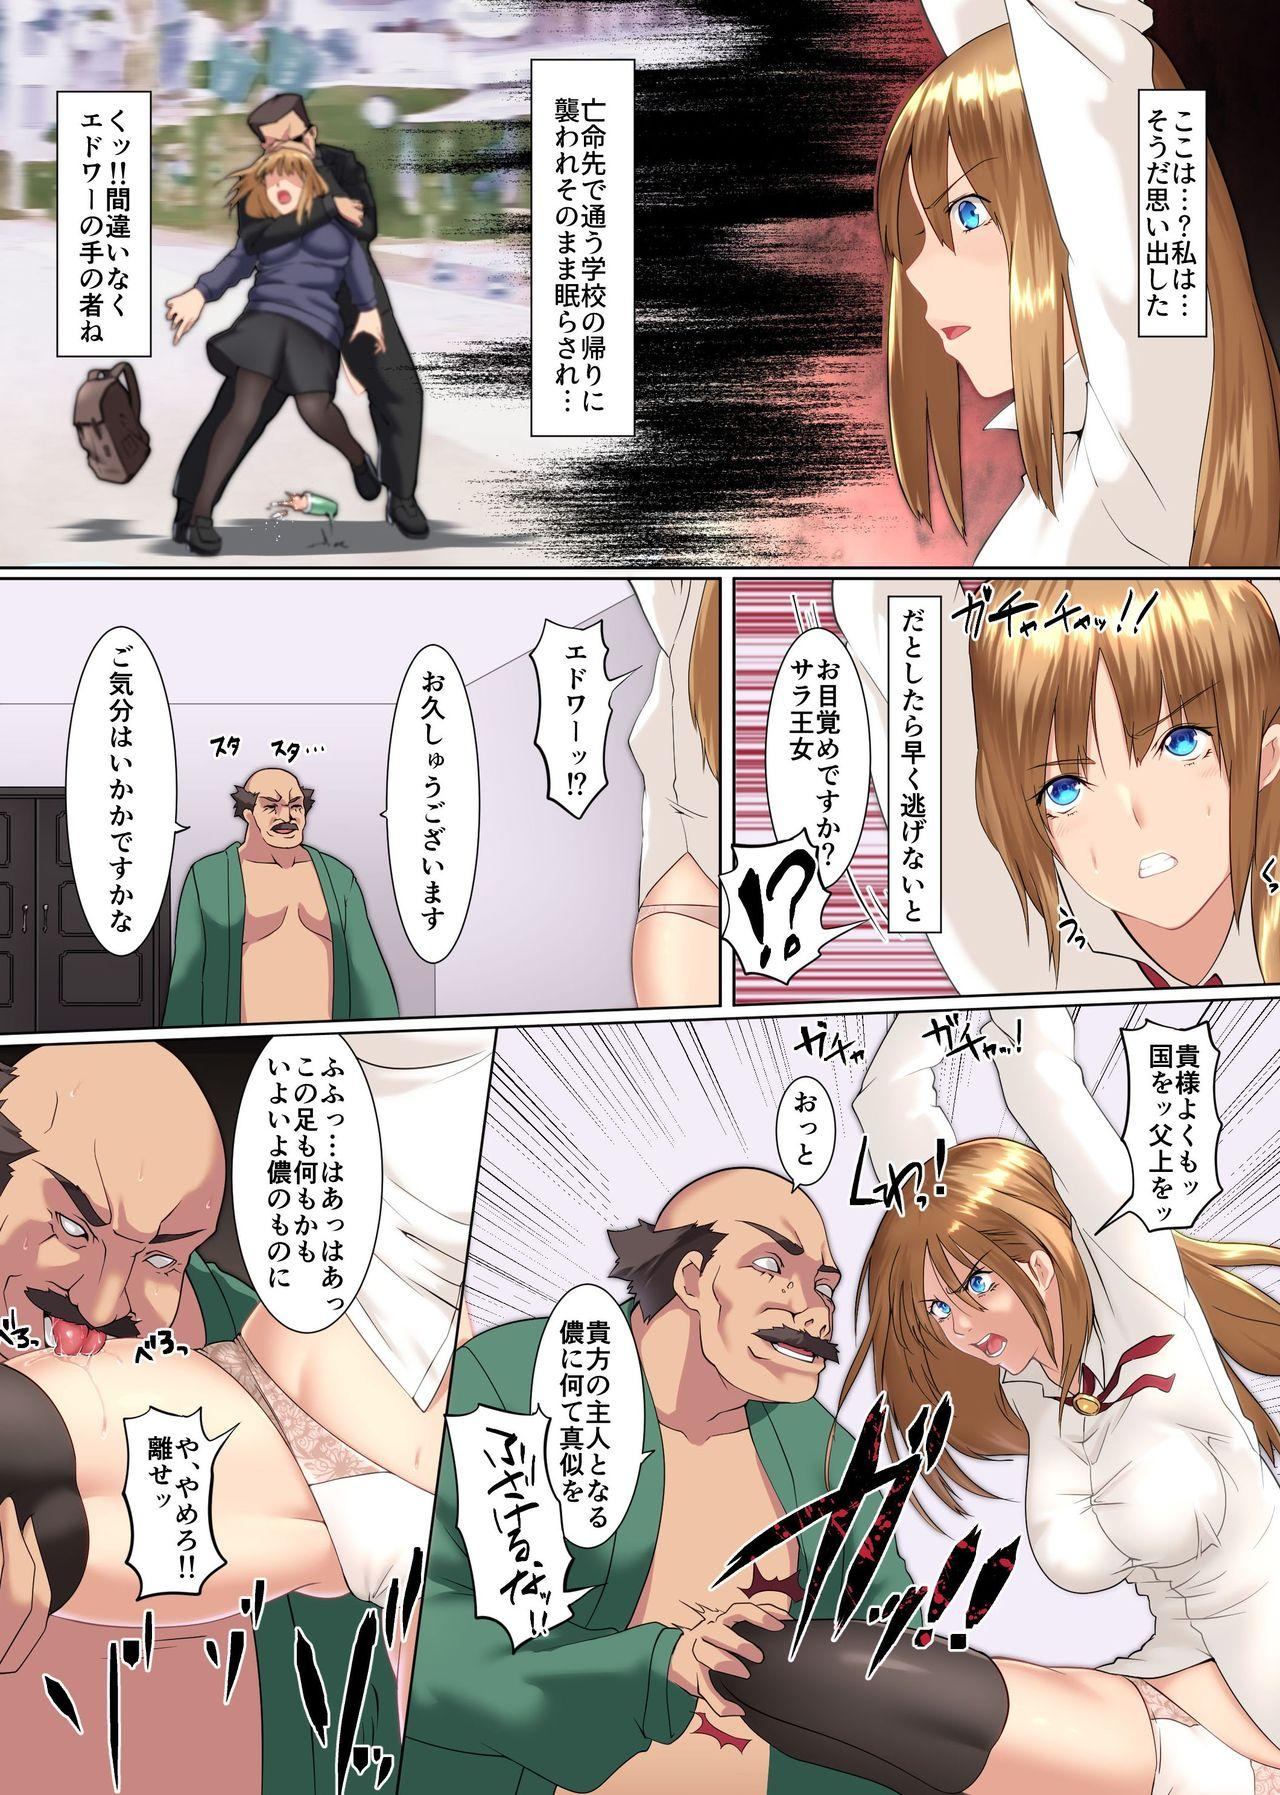 Mesuchiku 11